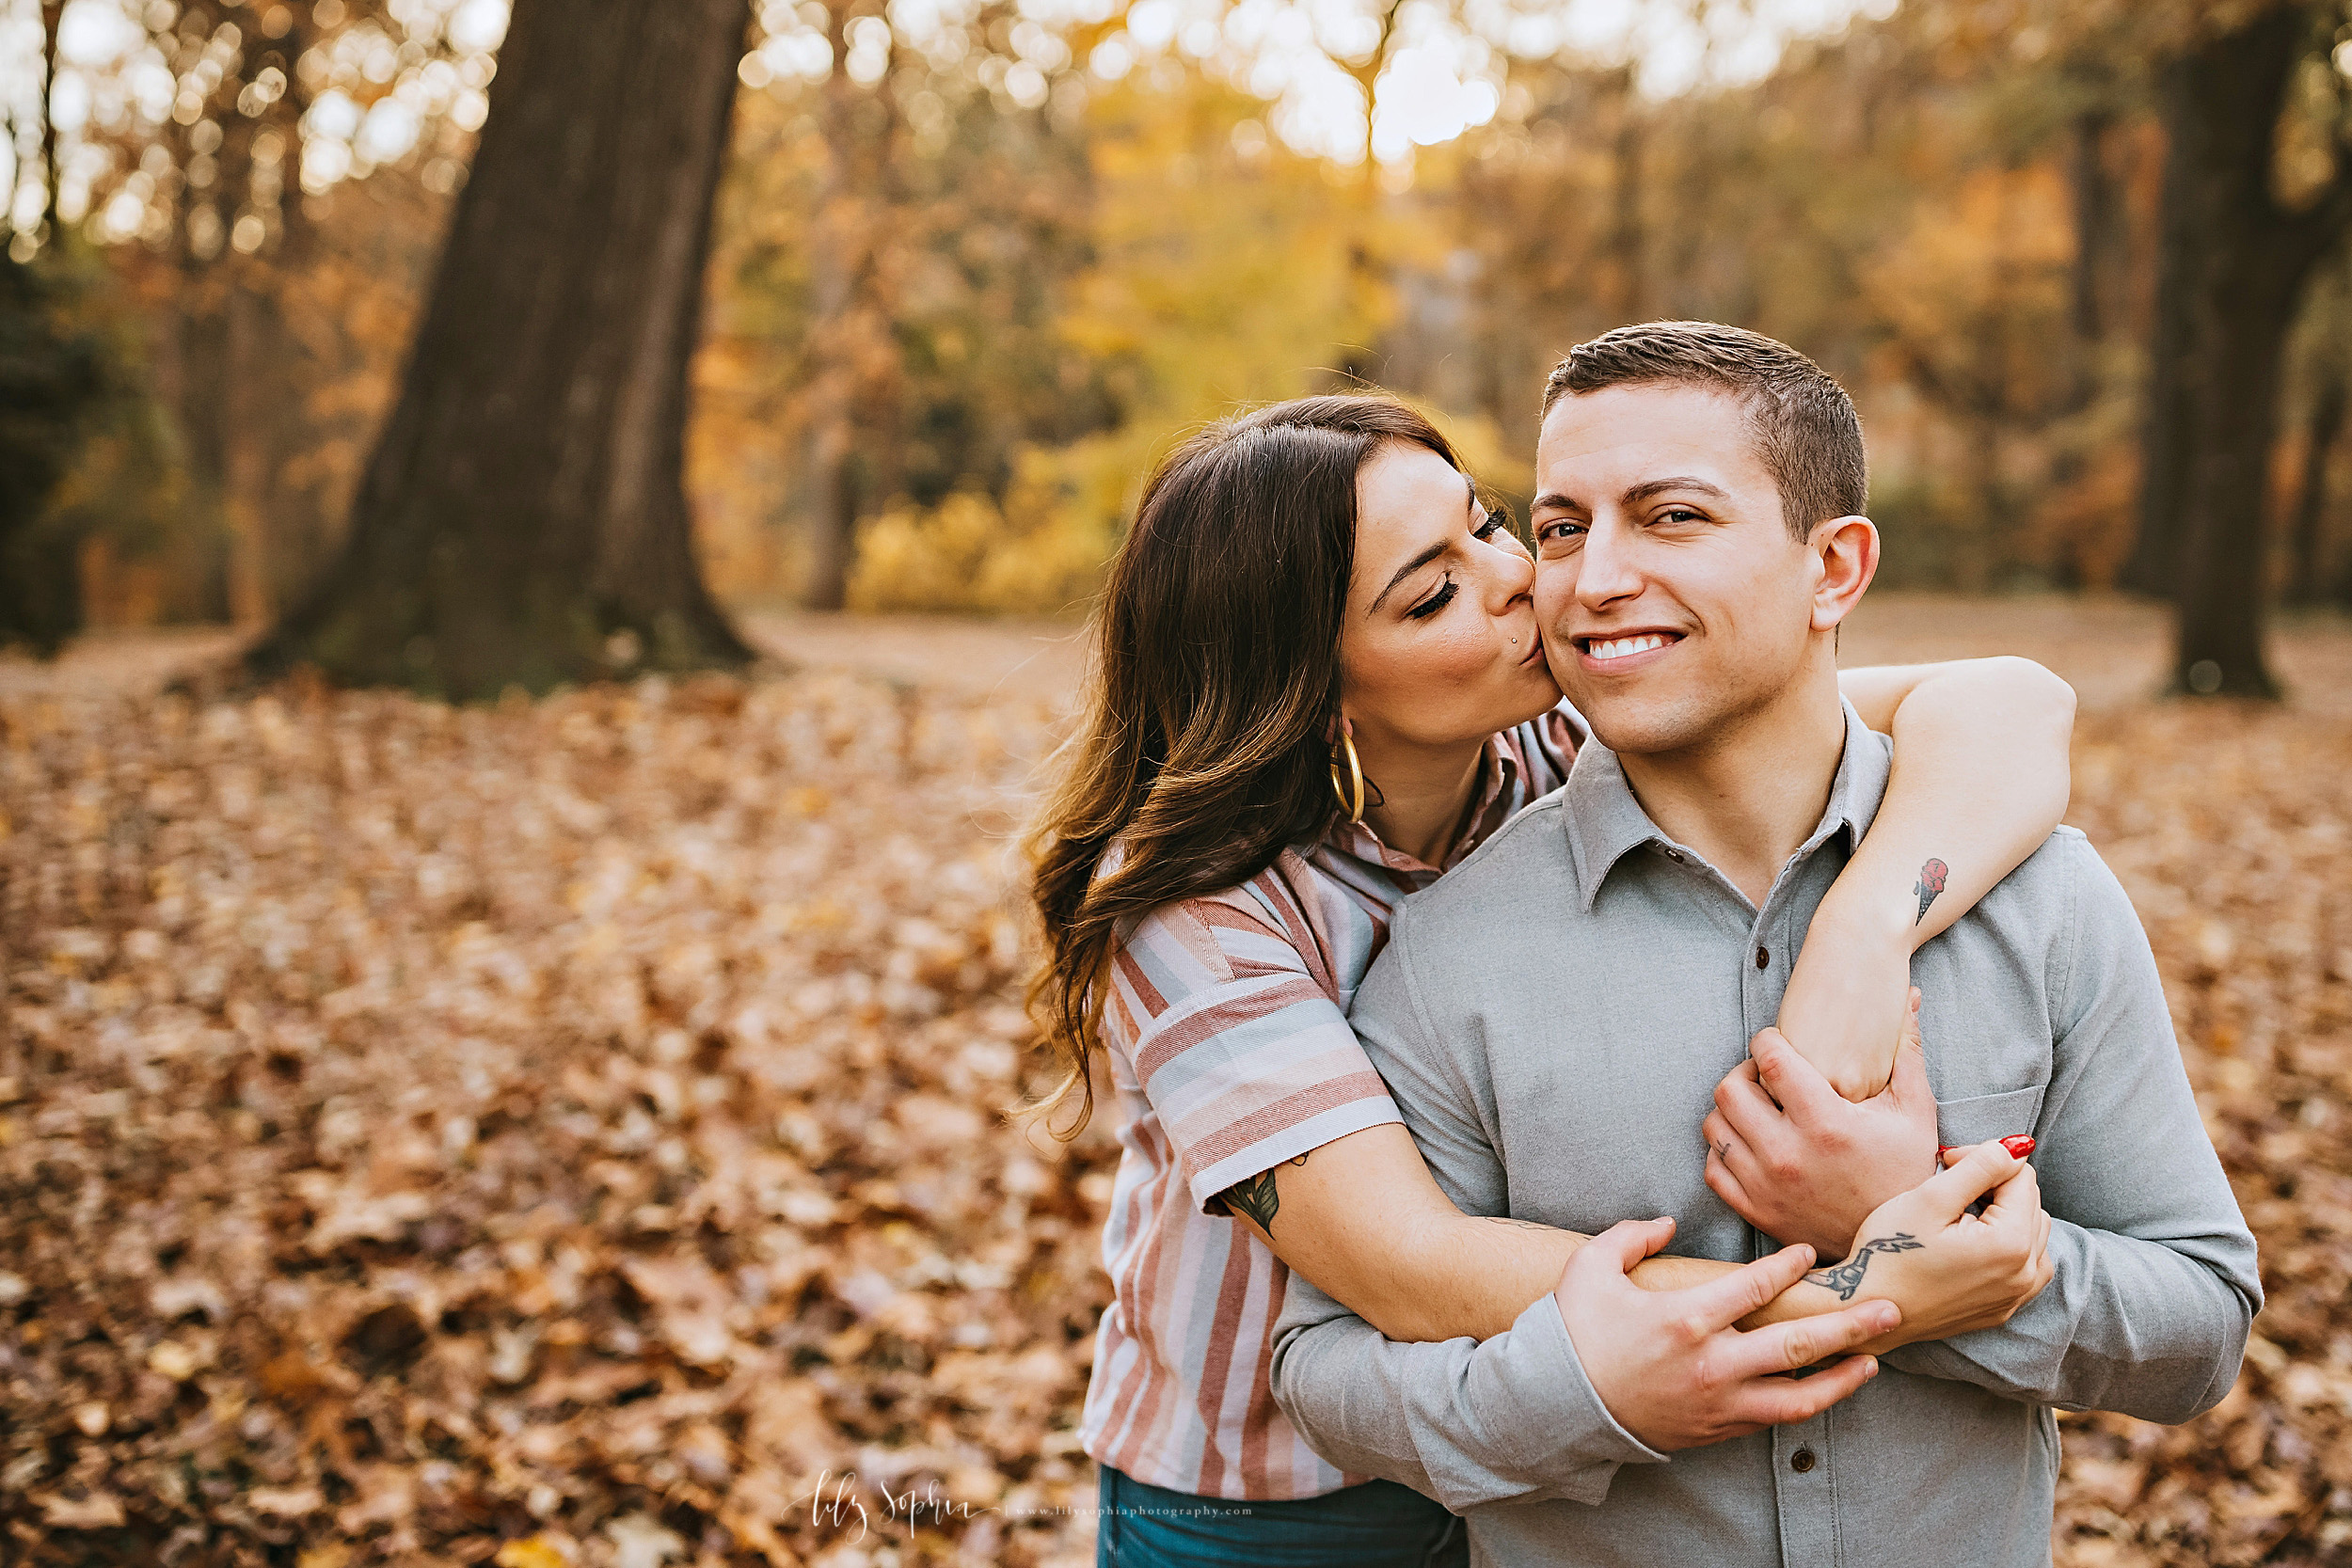 atlanta-reynoldstown-peoplestown-decatur-sandy-springs-buckhead-virginia-highlands-west-end-decatur-lily-sophia-photography-outdoor-fall-couples-photos_1485.jpg